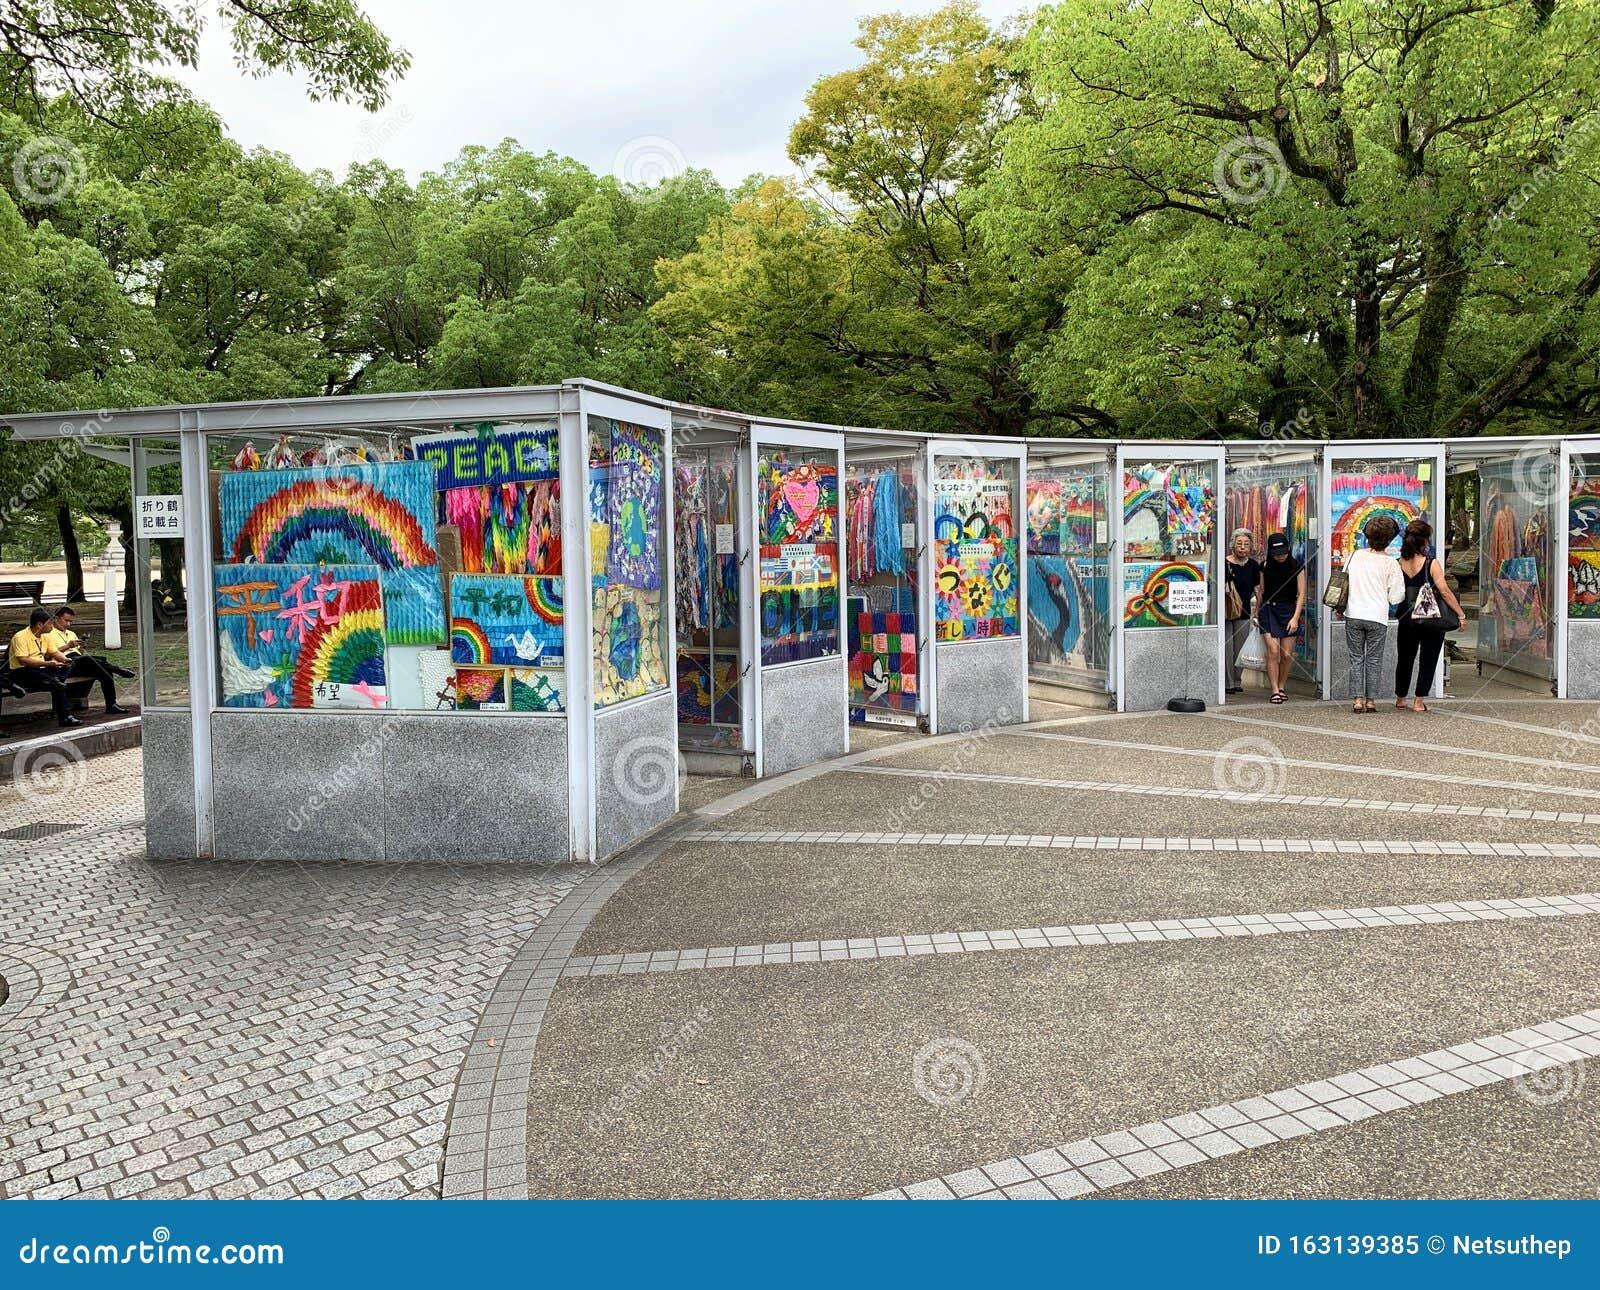 On 69th Anniversary Of Hiroshima Bombing, Remembering